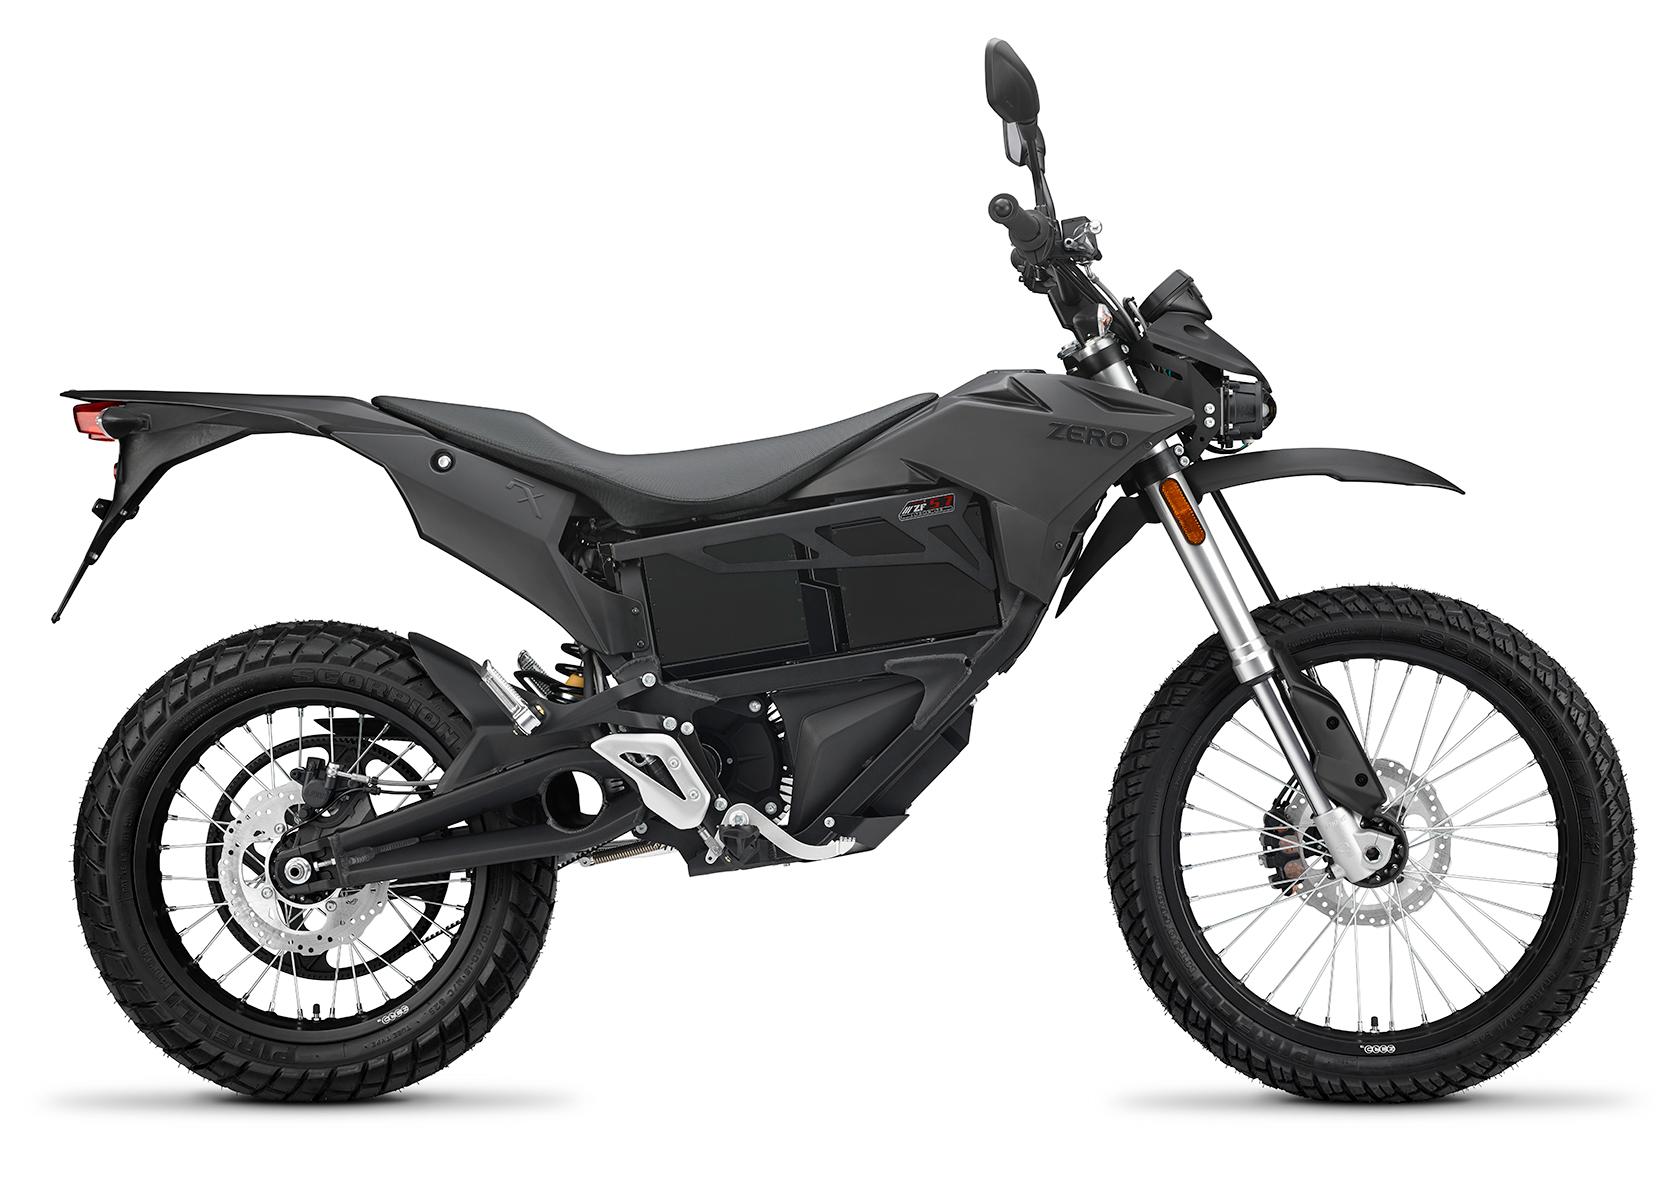 2015 Zero FX Electric Motorcycle: Black Profile Right, White Background